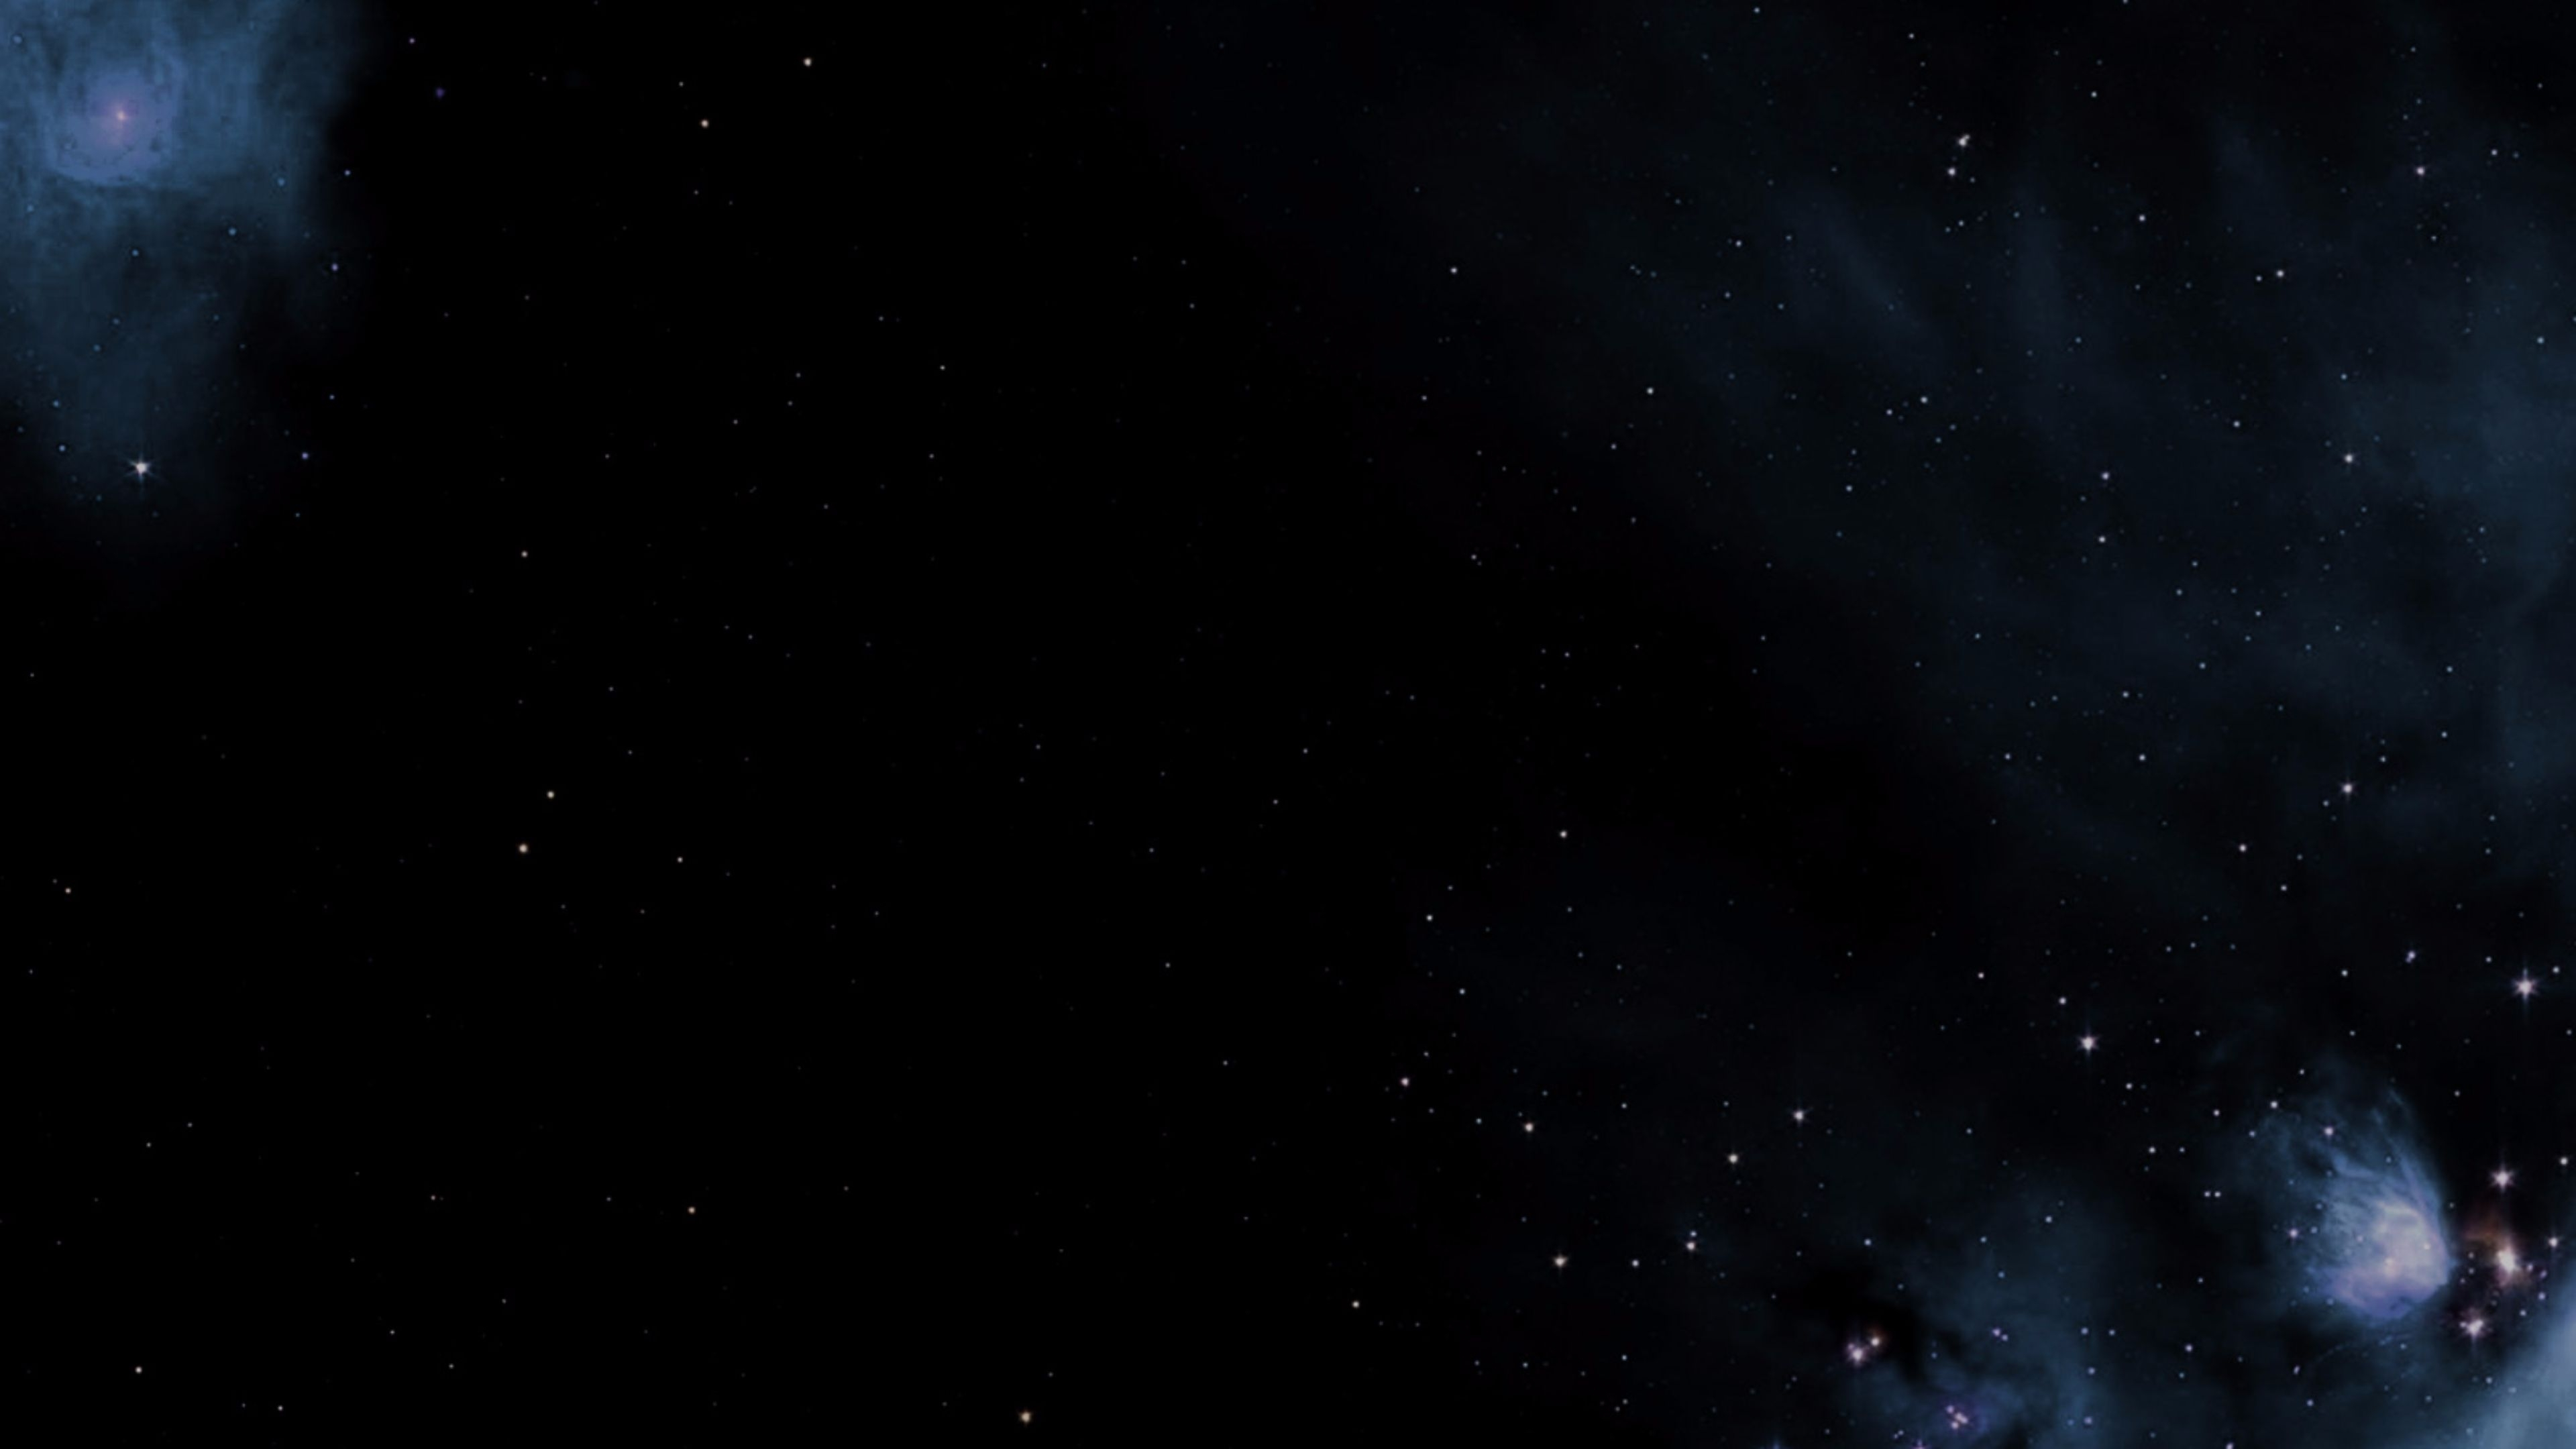 dark space wallpapers hd - media file   pixelstalk